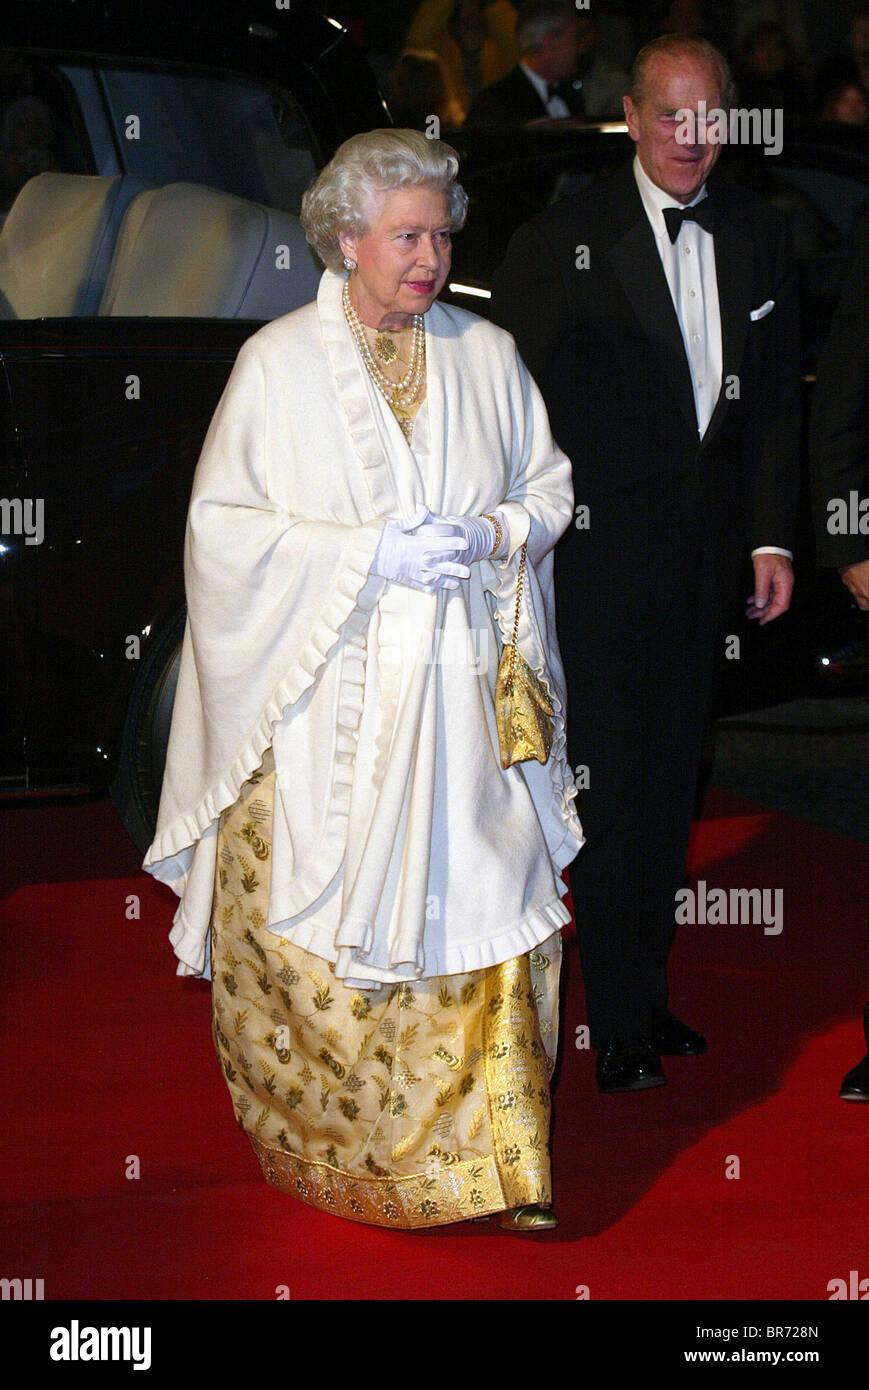 QUEEN ELIZABETH PRINCE PHILIP MEMBERS OF THE ROYAL FAMILY 18 November 2002 ROYAL ALBERT HALL LONDON ENGLAND - Stock Image